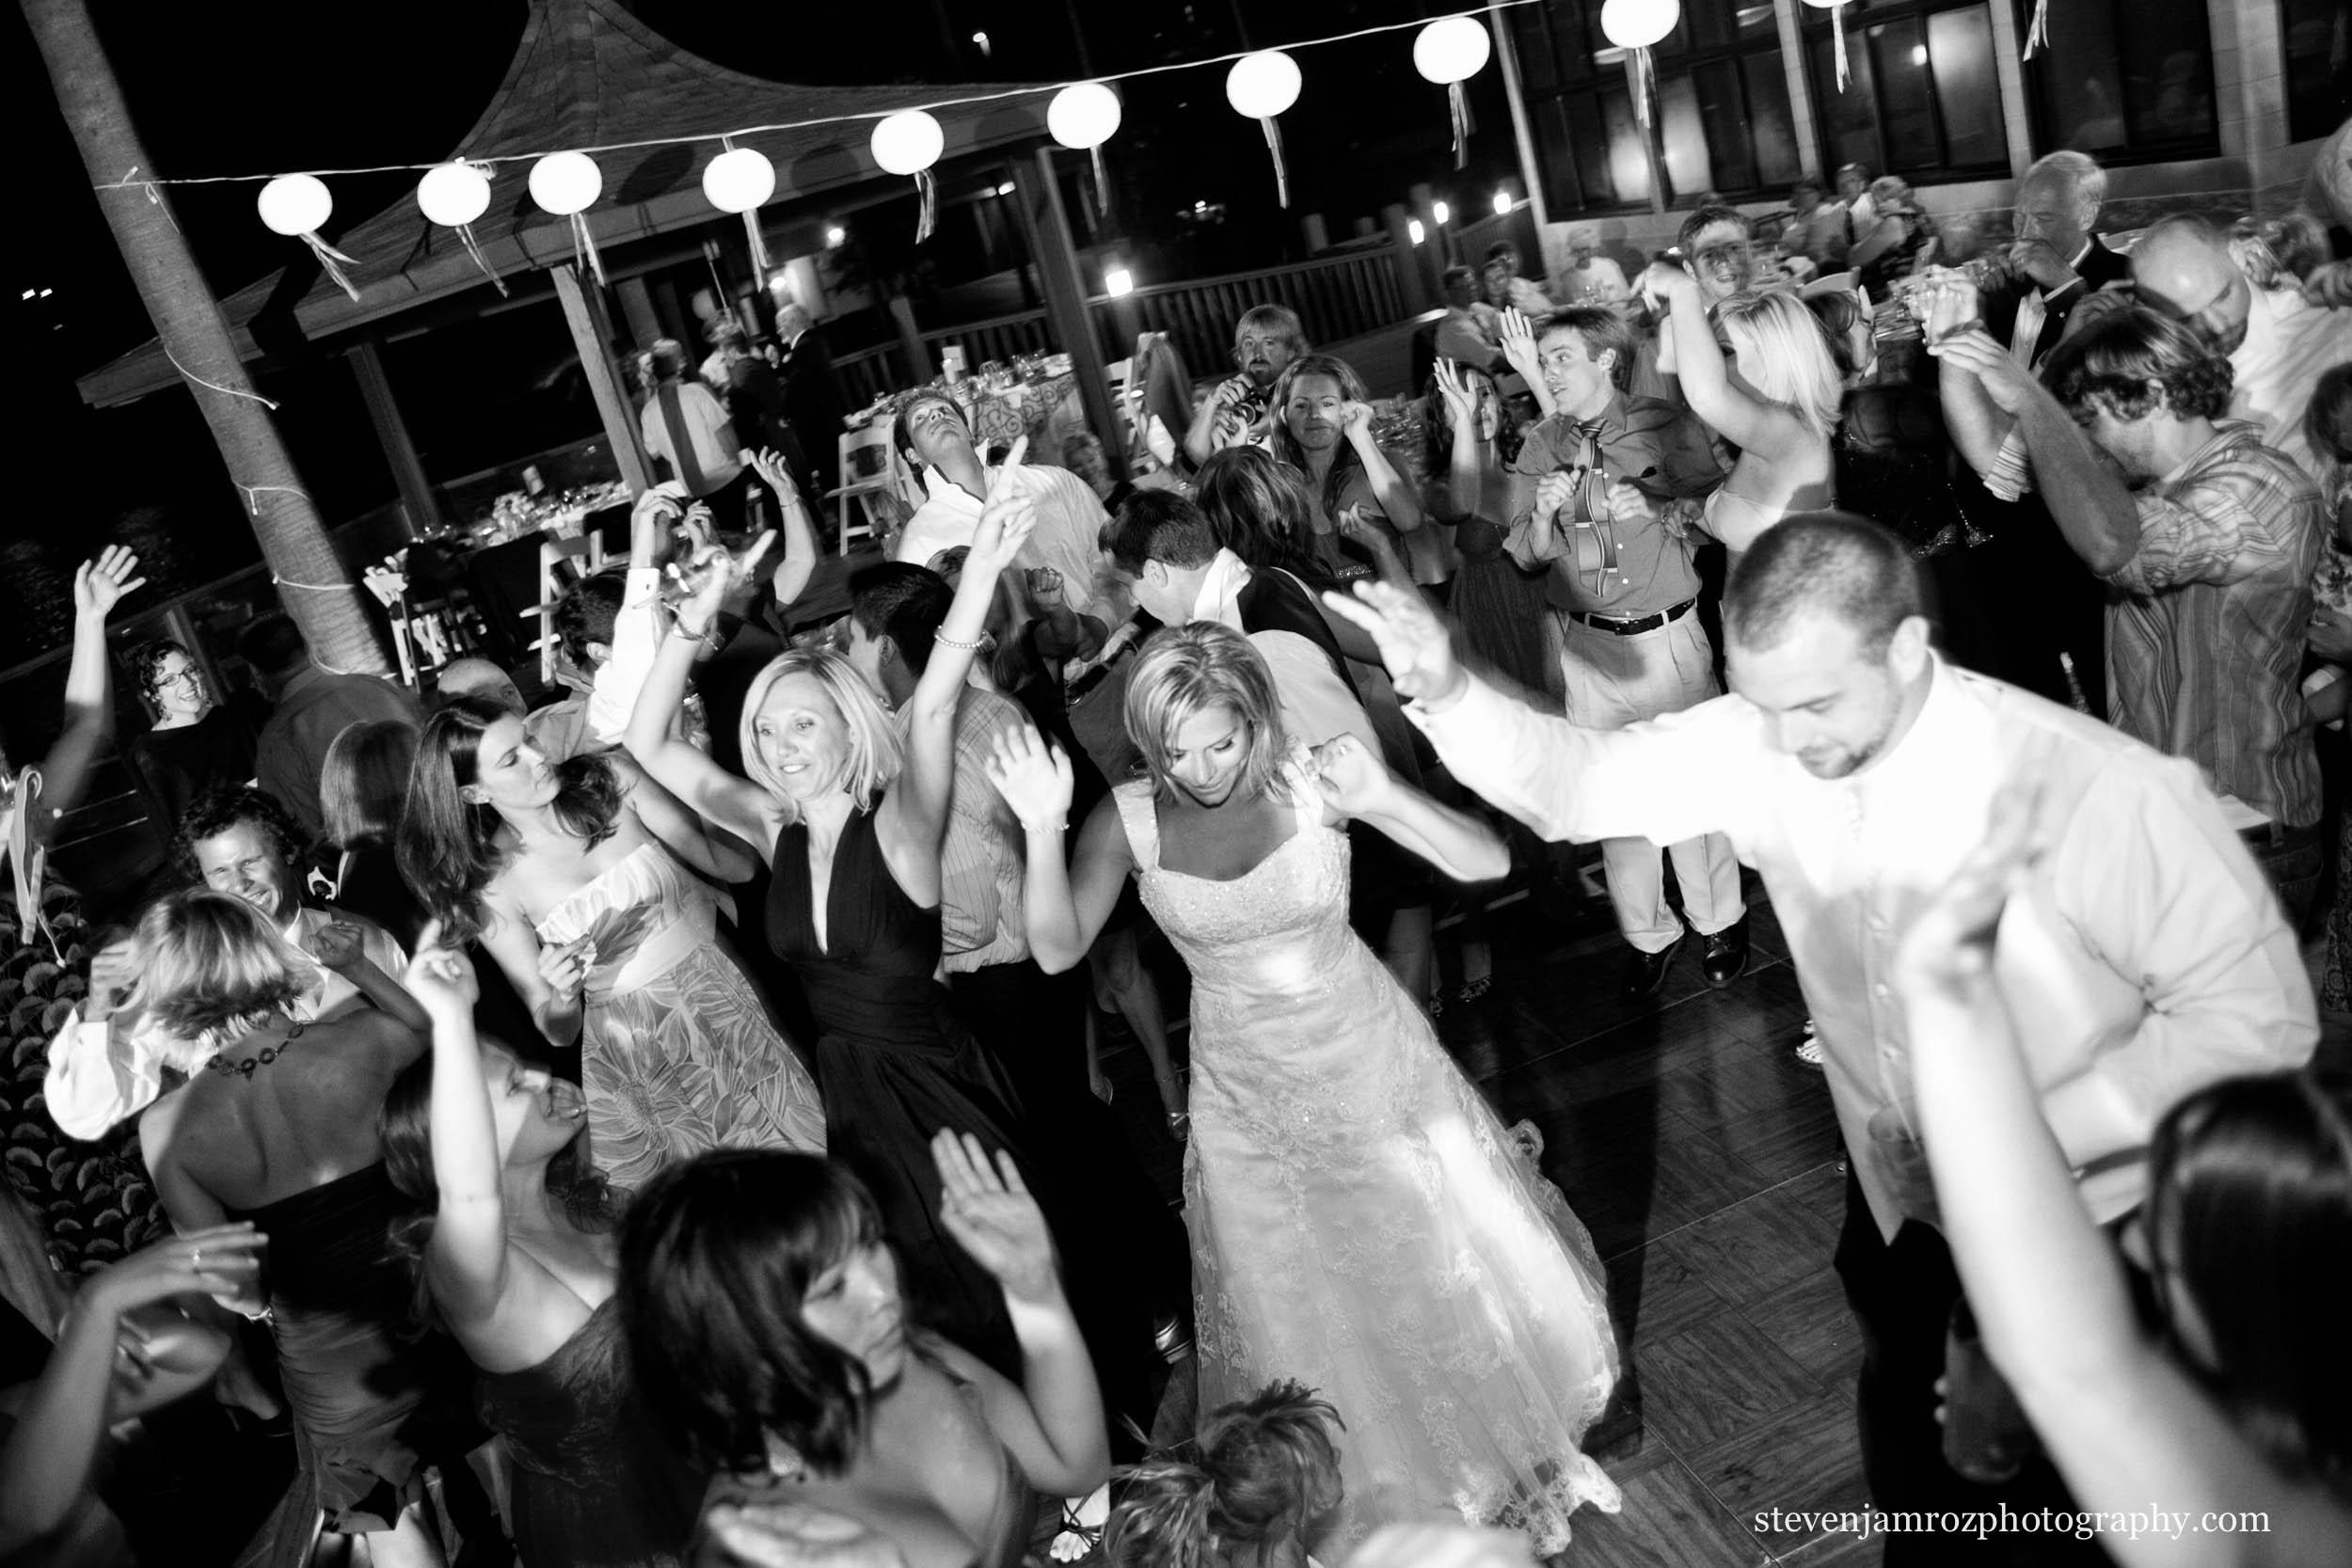 large-wedding-reception-dancing-raleigh-photographer-0842.jpg